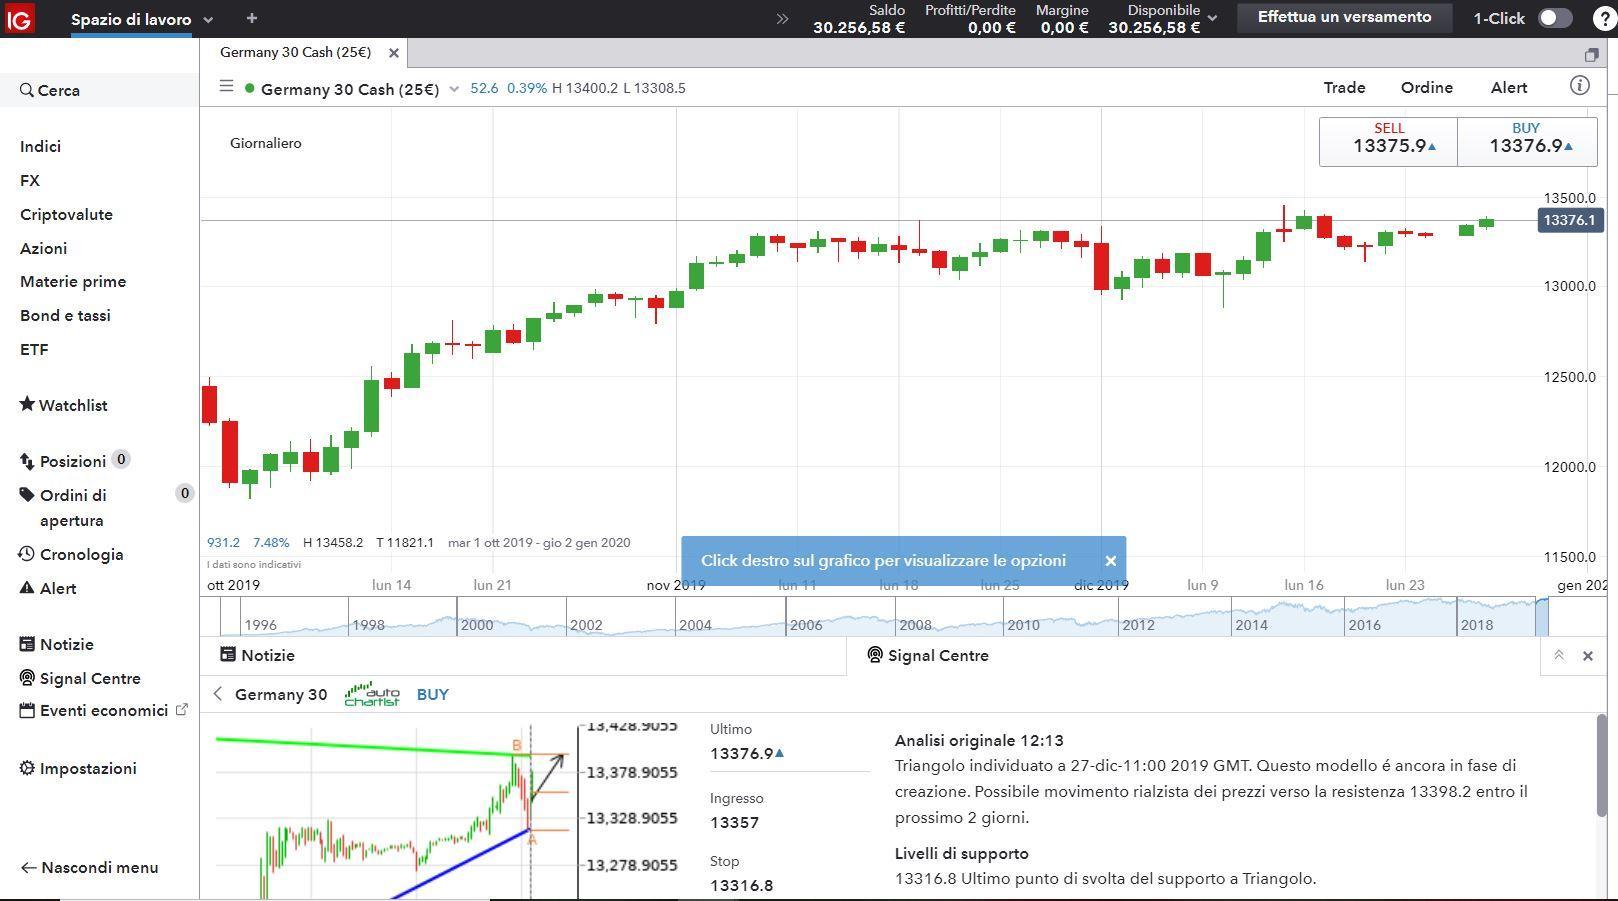 Segnali di trading: Migliori Affidabili Gratis [Efficaci]